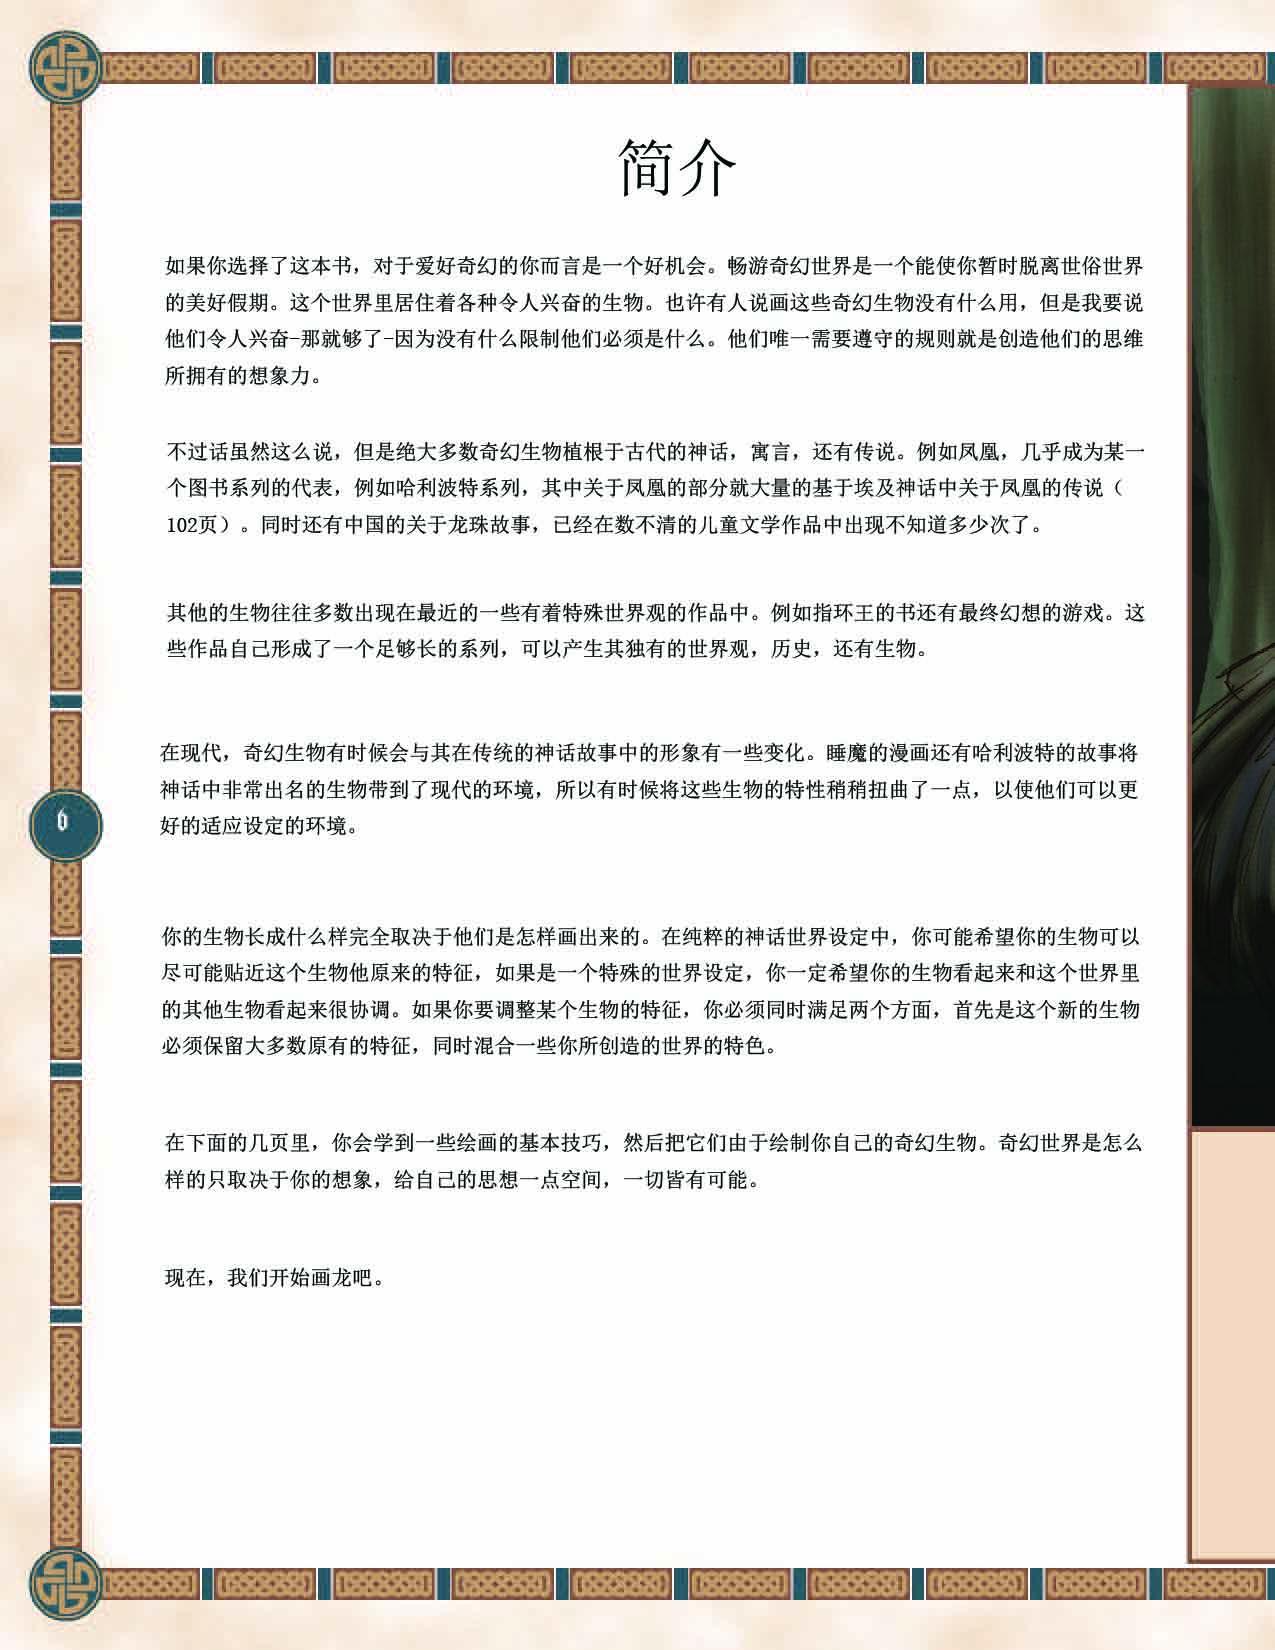 i_418_5120f2c3237f5.jpeg